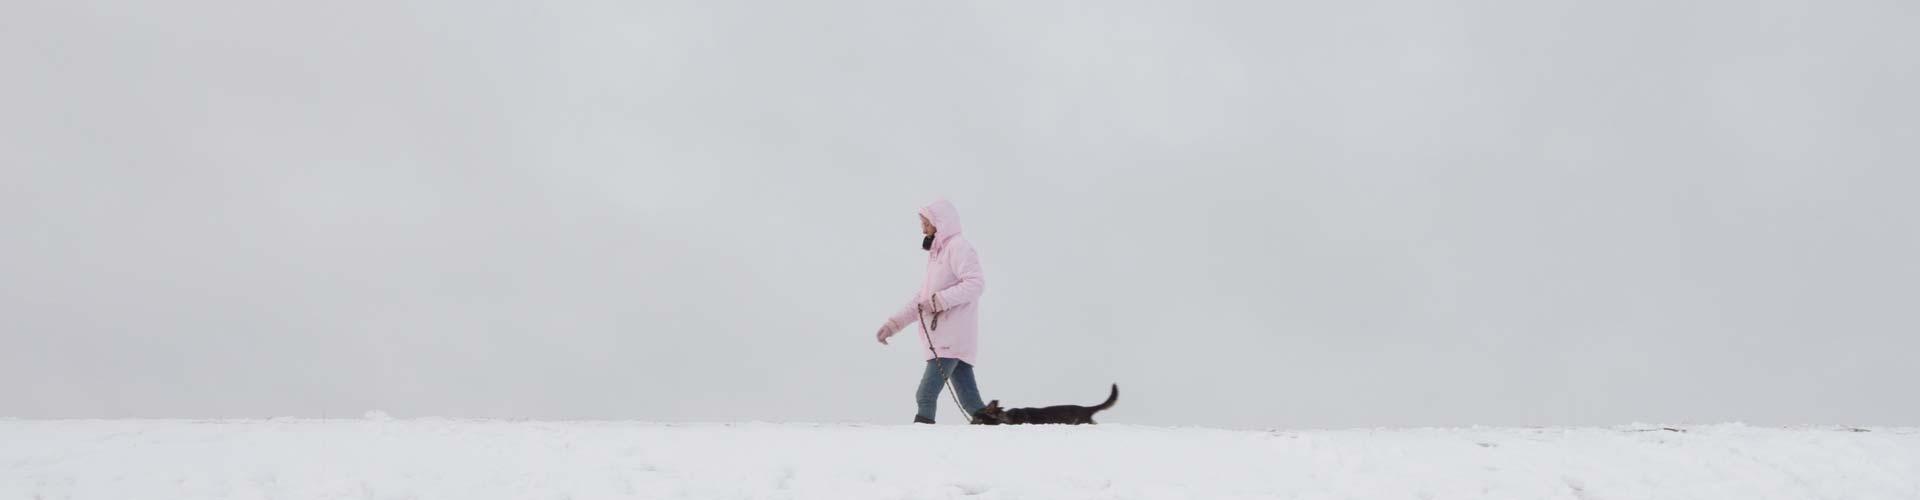 Winterspaziergang am Deich